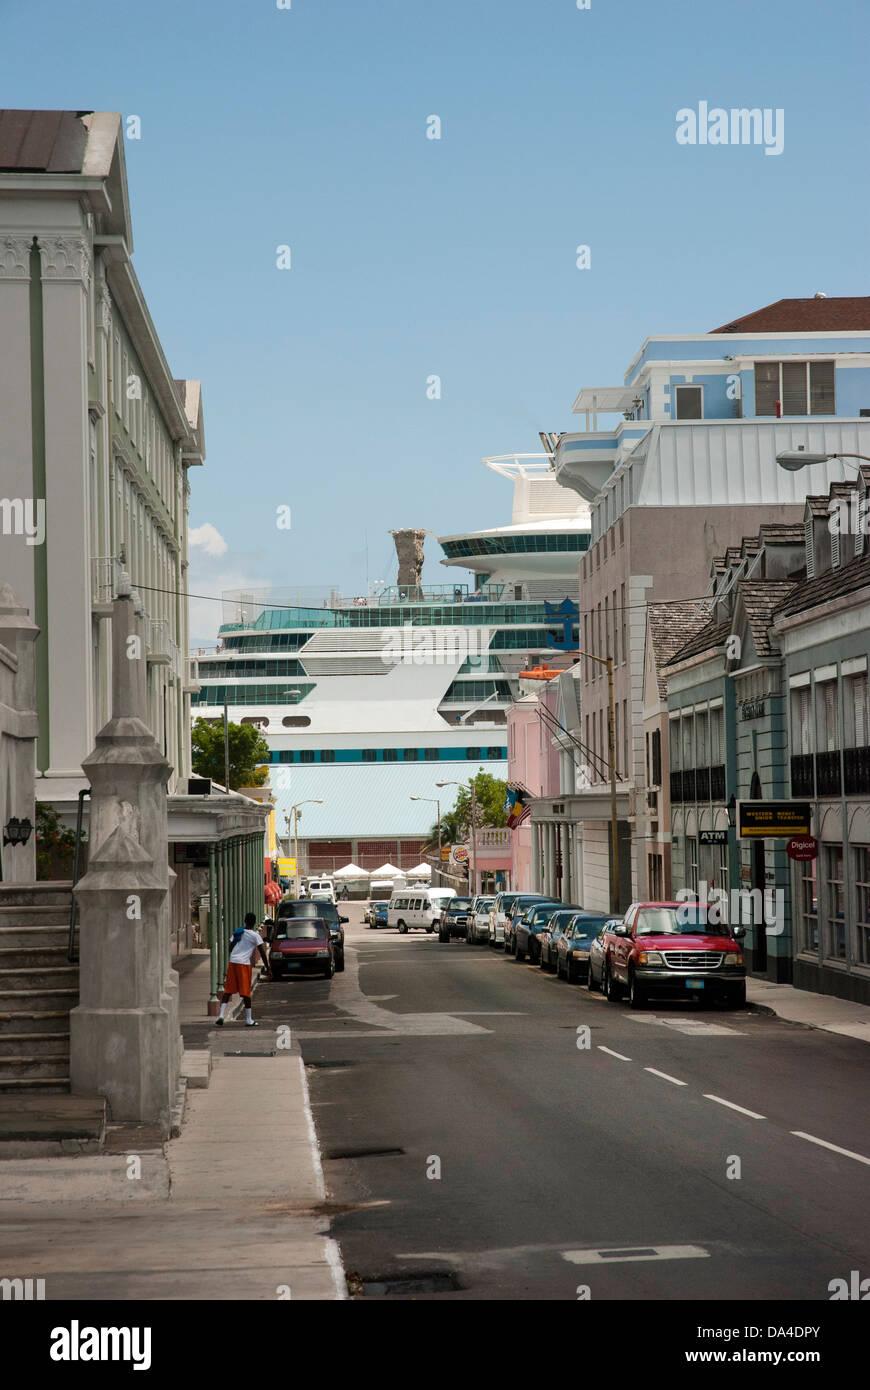 Nassau cruise port area - Stock Image